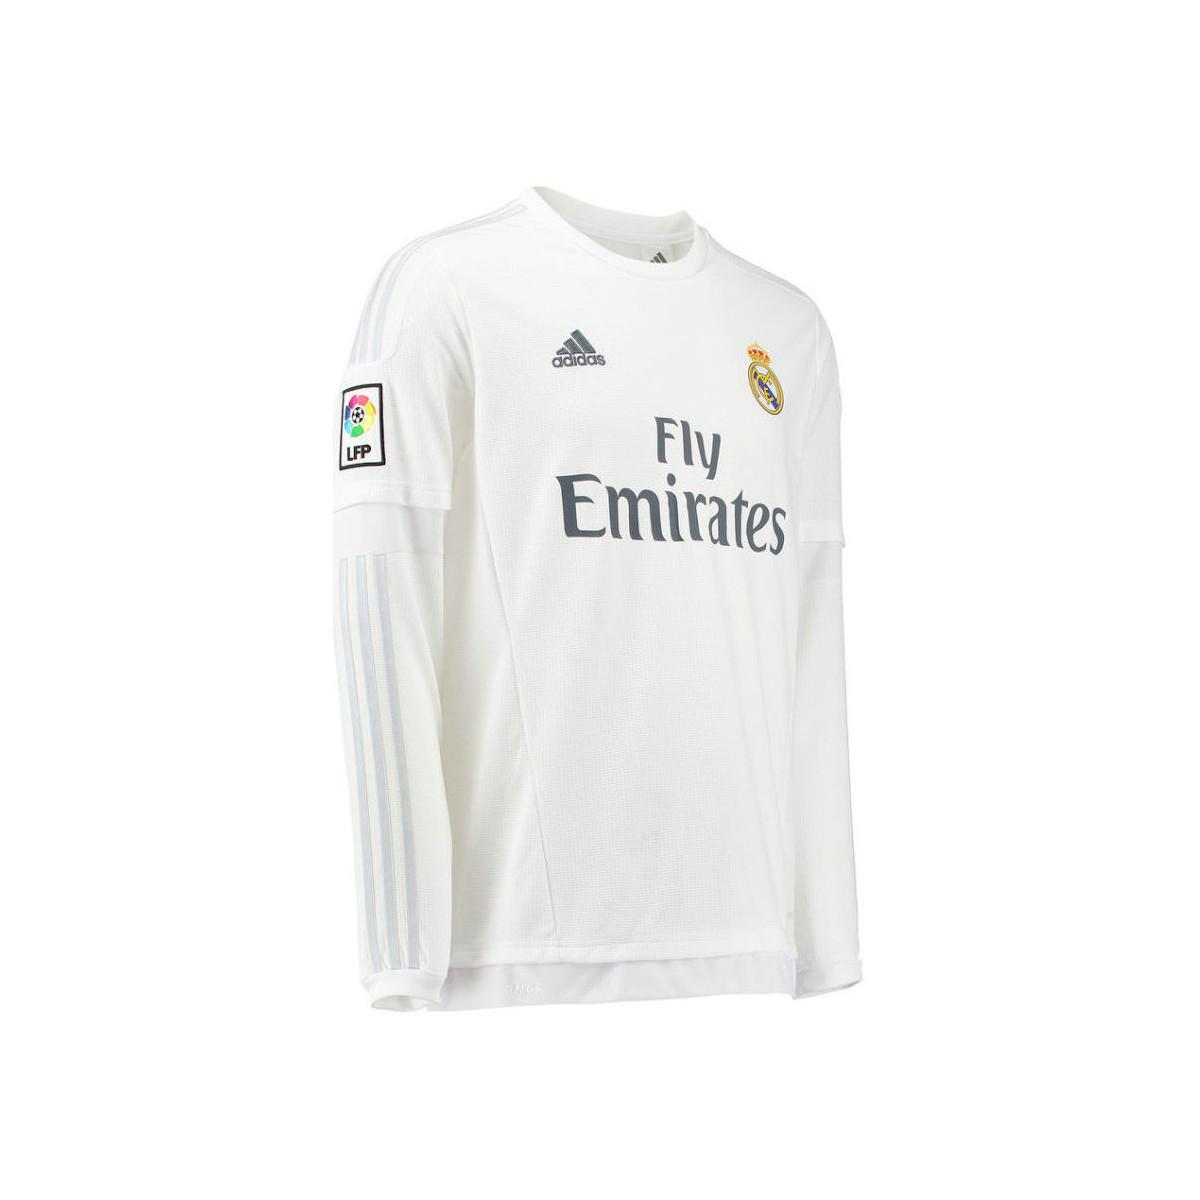 size 40 0e010 39c6c Adidas 2015-16 Real Madrid Long Sleeve Home Shirt (modric 19 ...